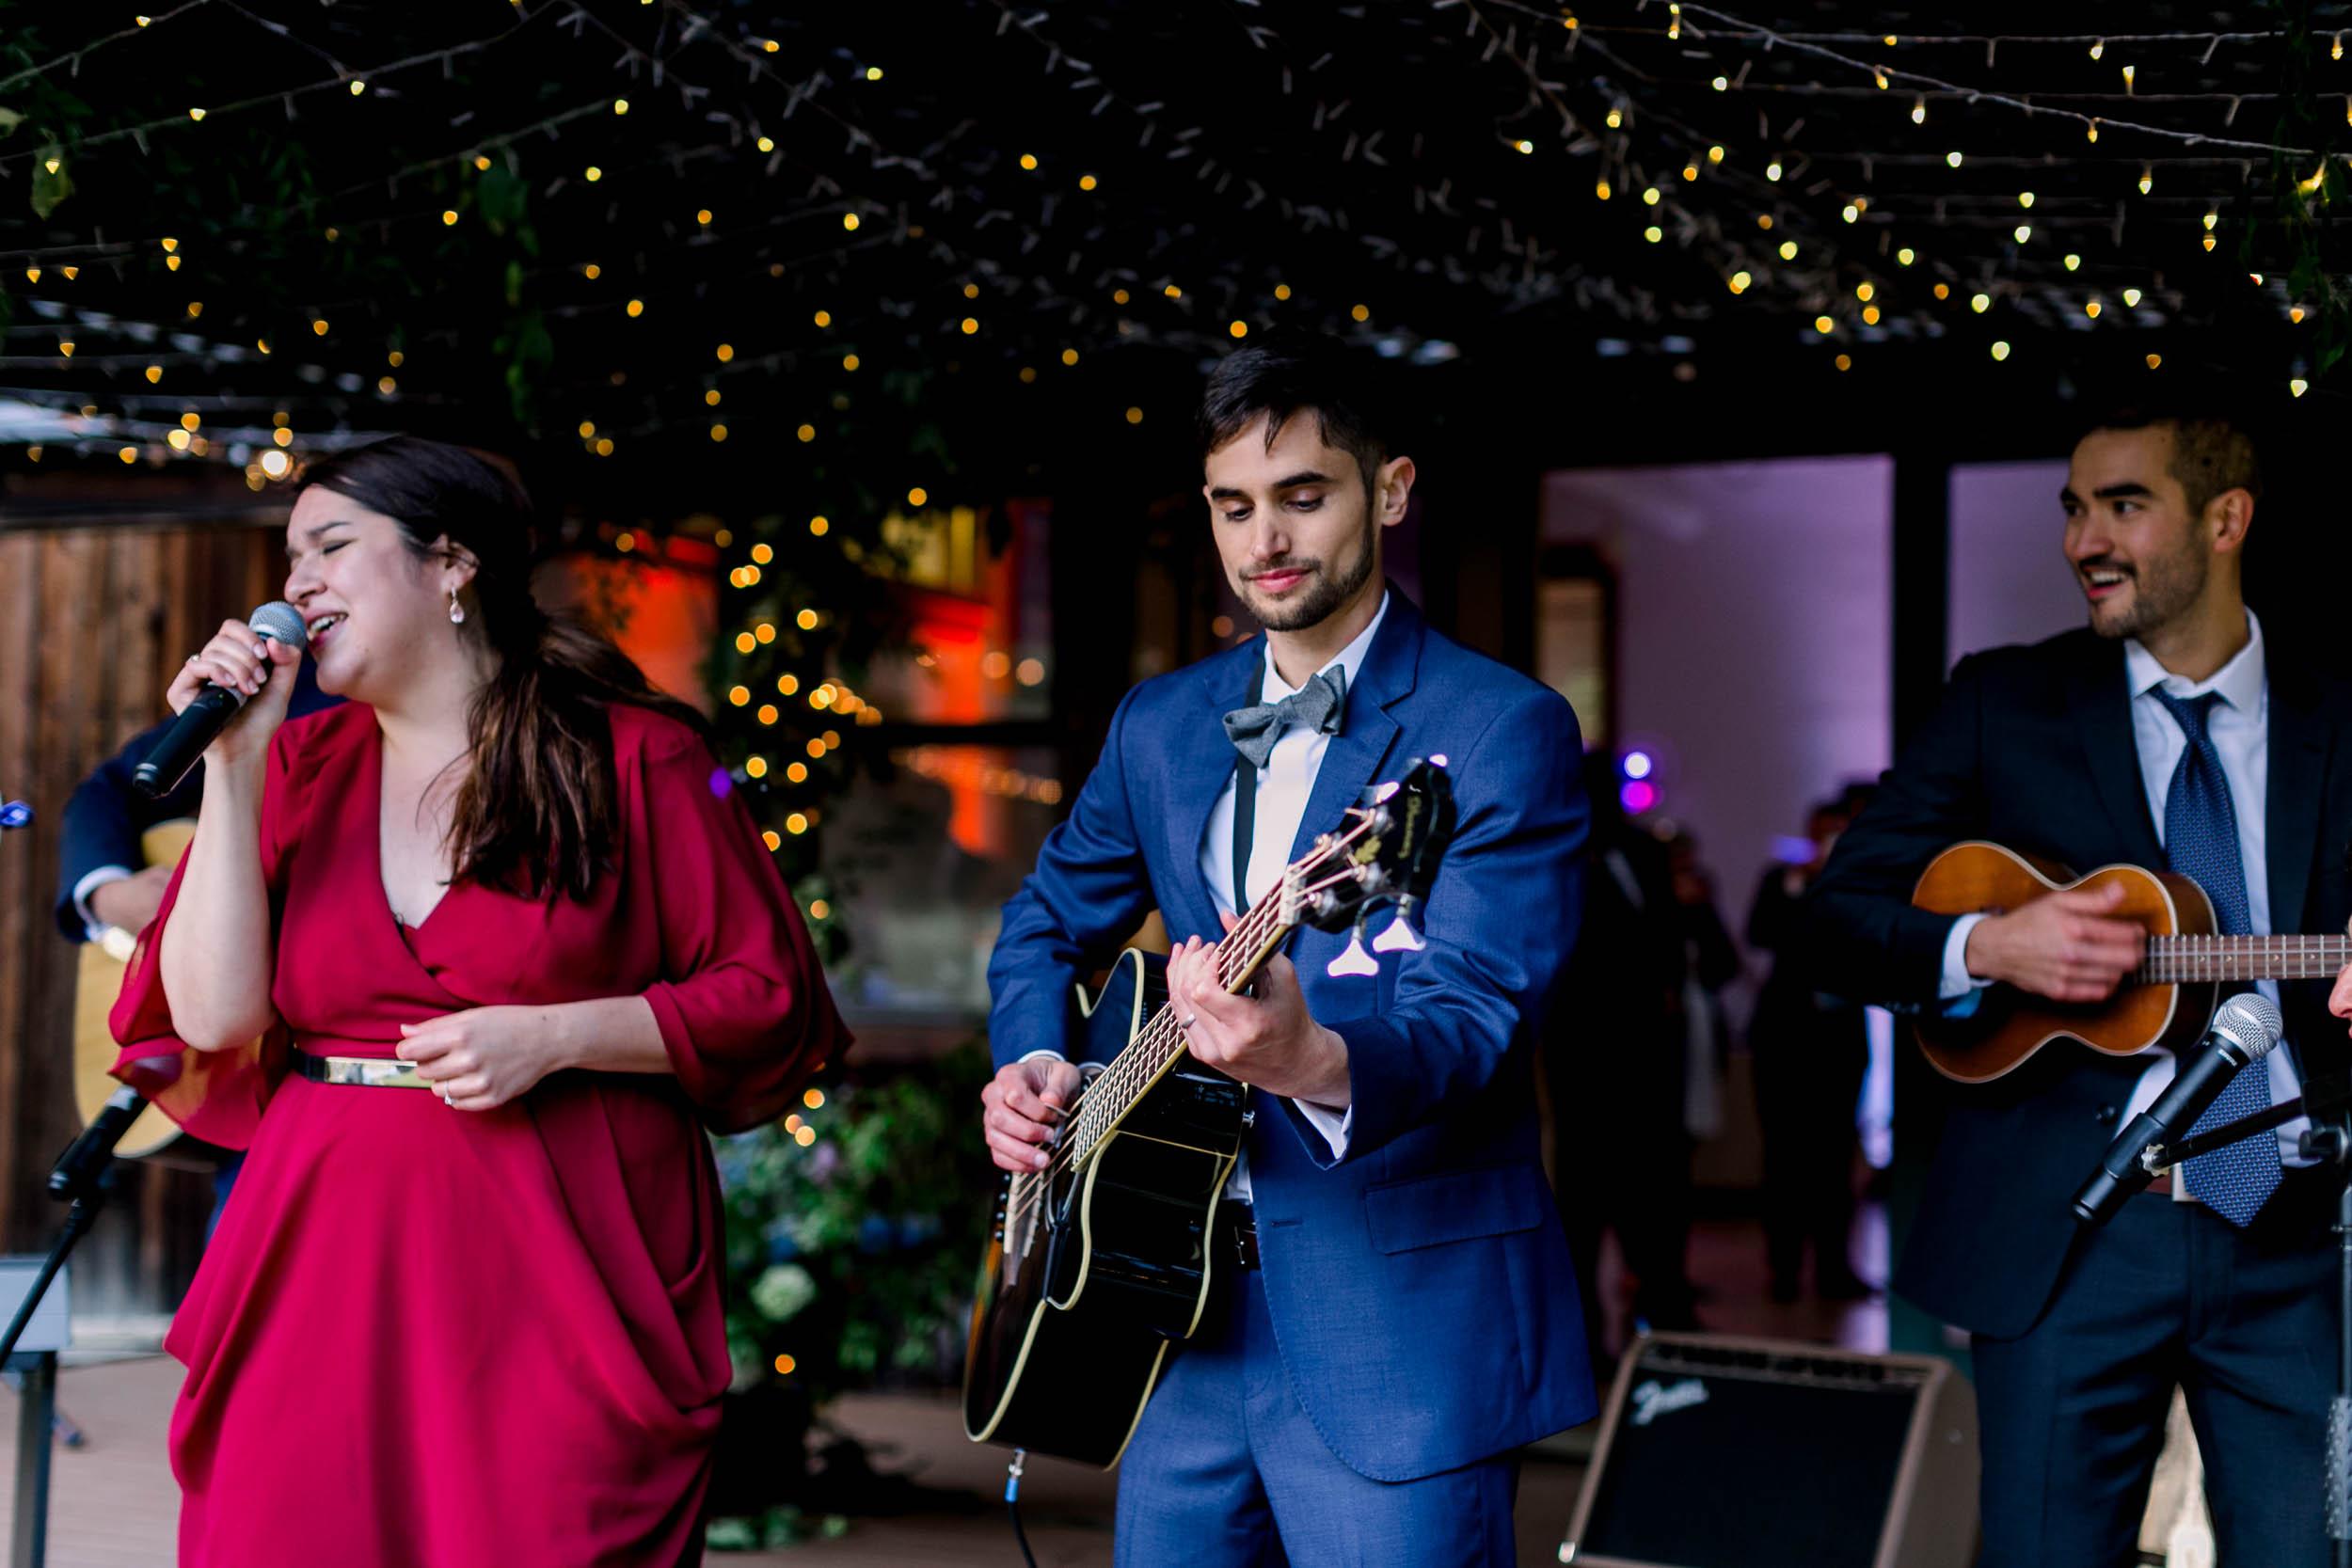 052519_B+S_Hidden Villa Wedding_Buena Lane Photography_052519_0950CY.jpg